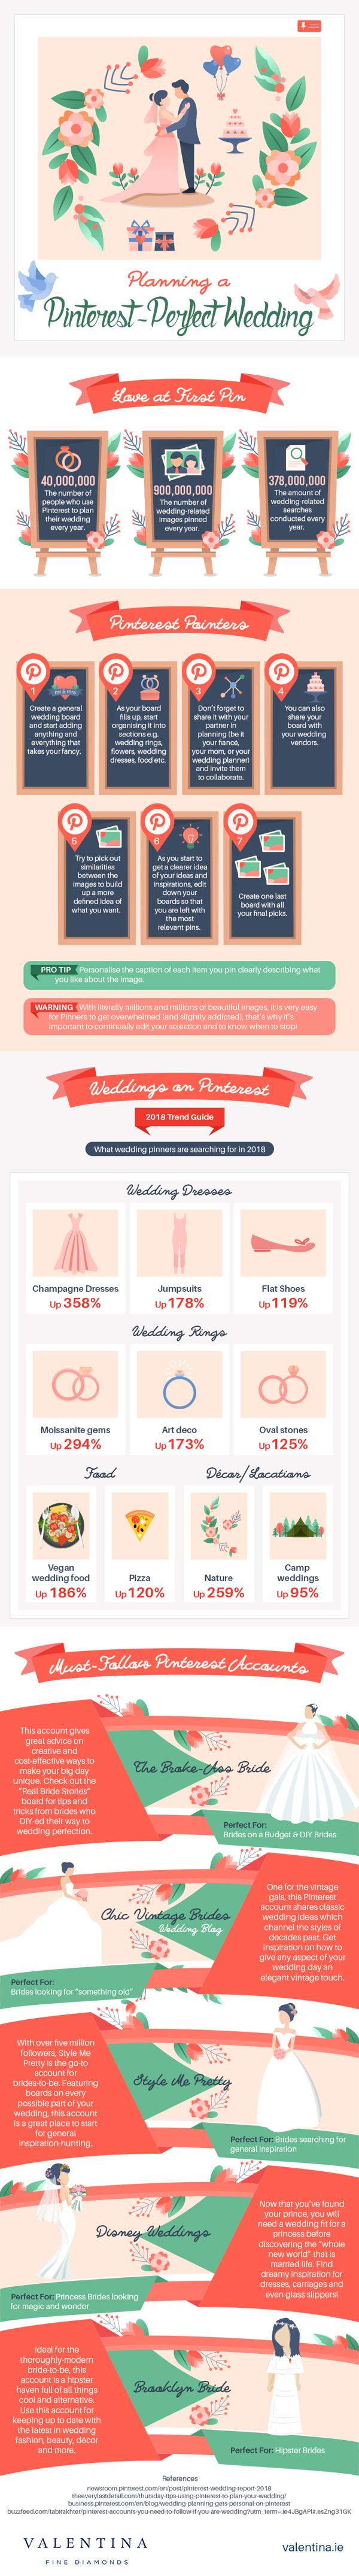 Planning a Perfect Pinterest Wedding 1